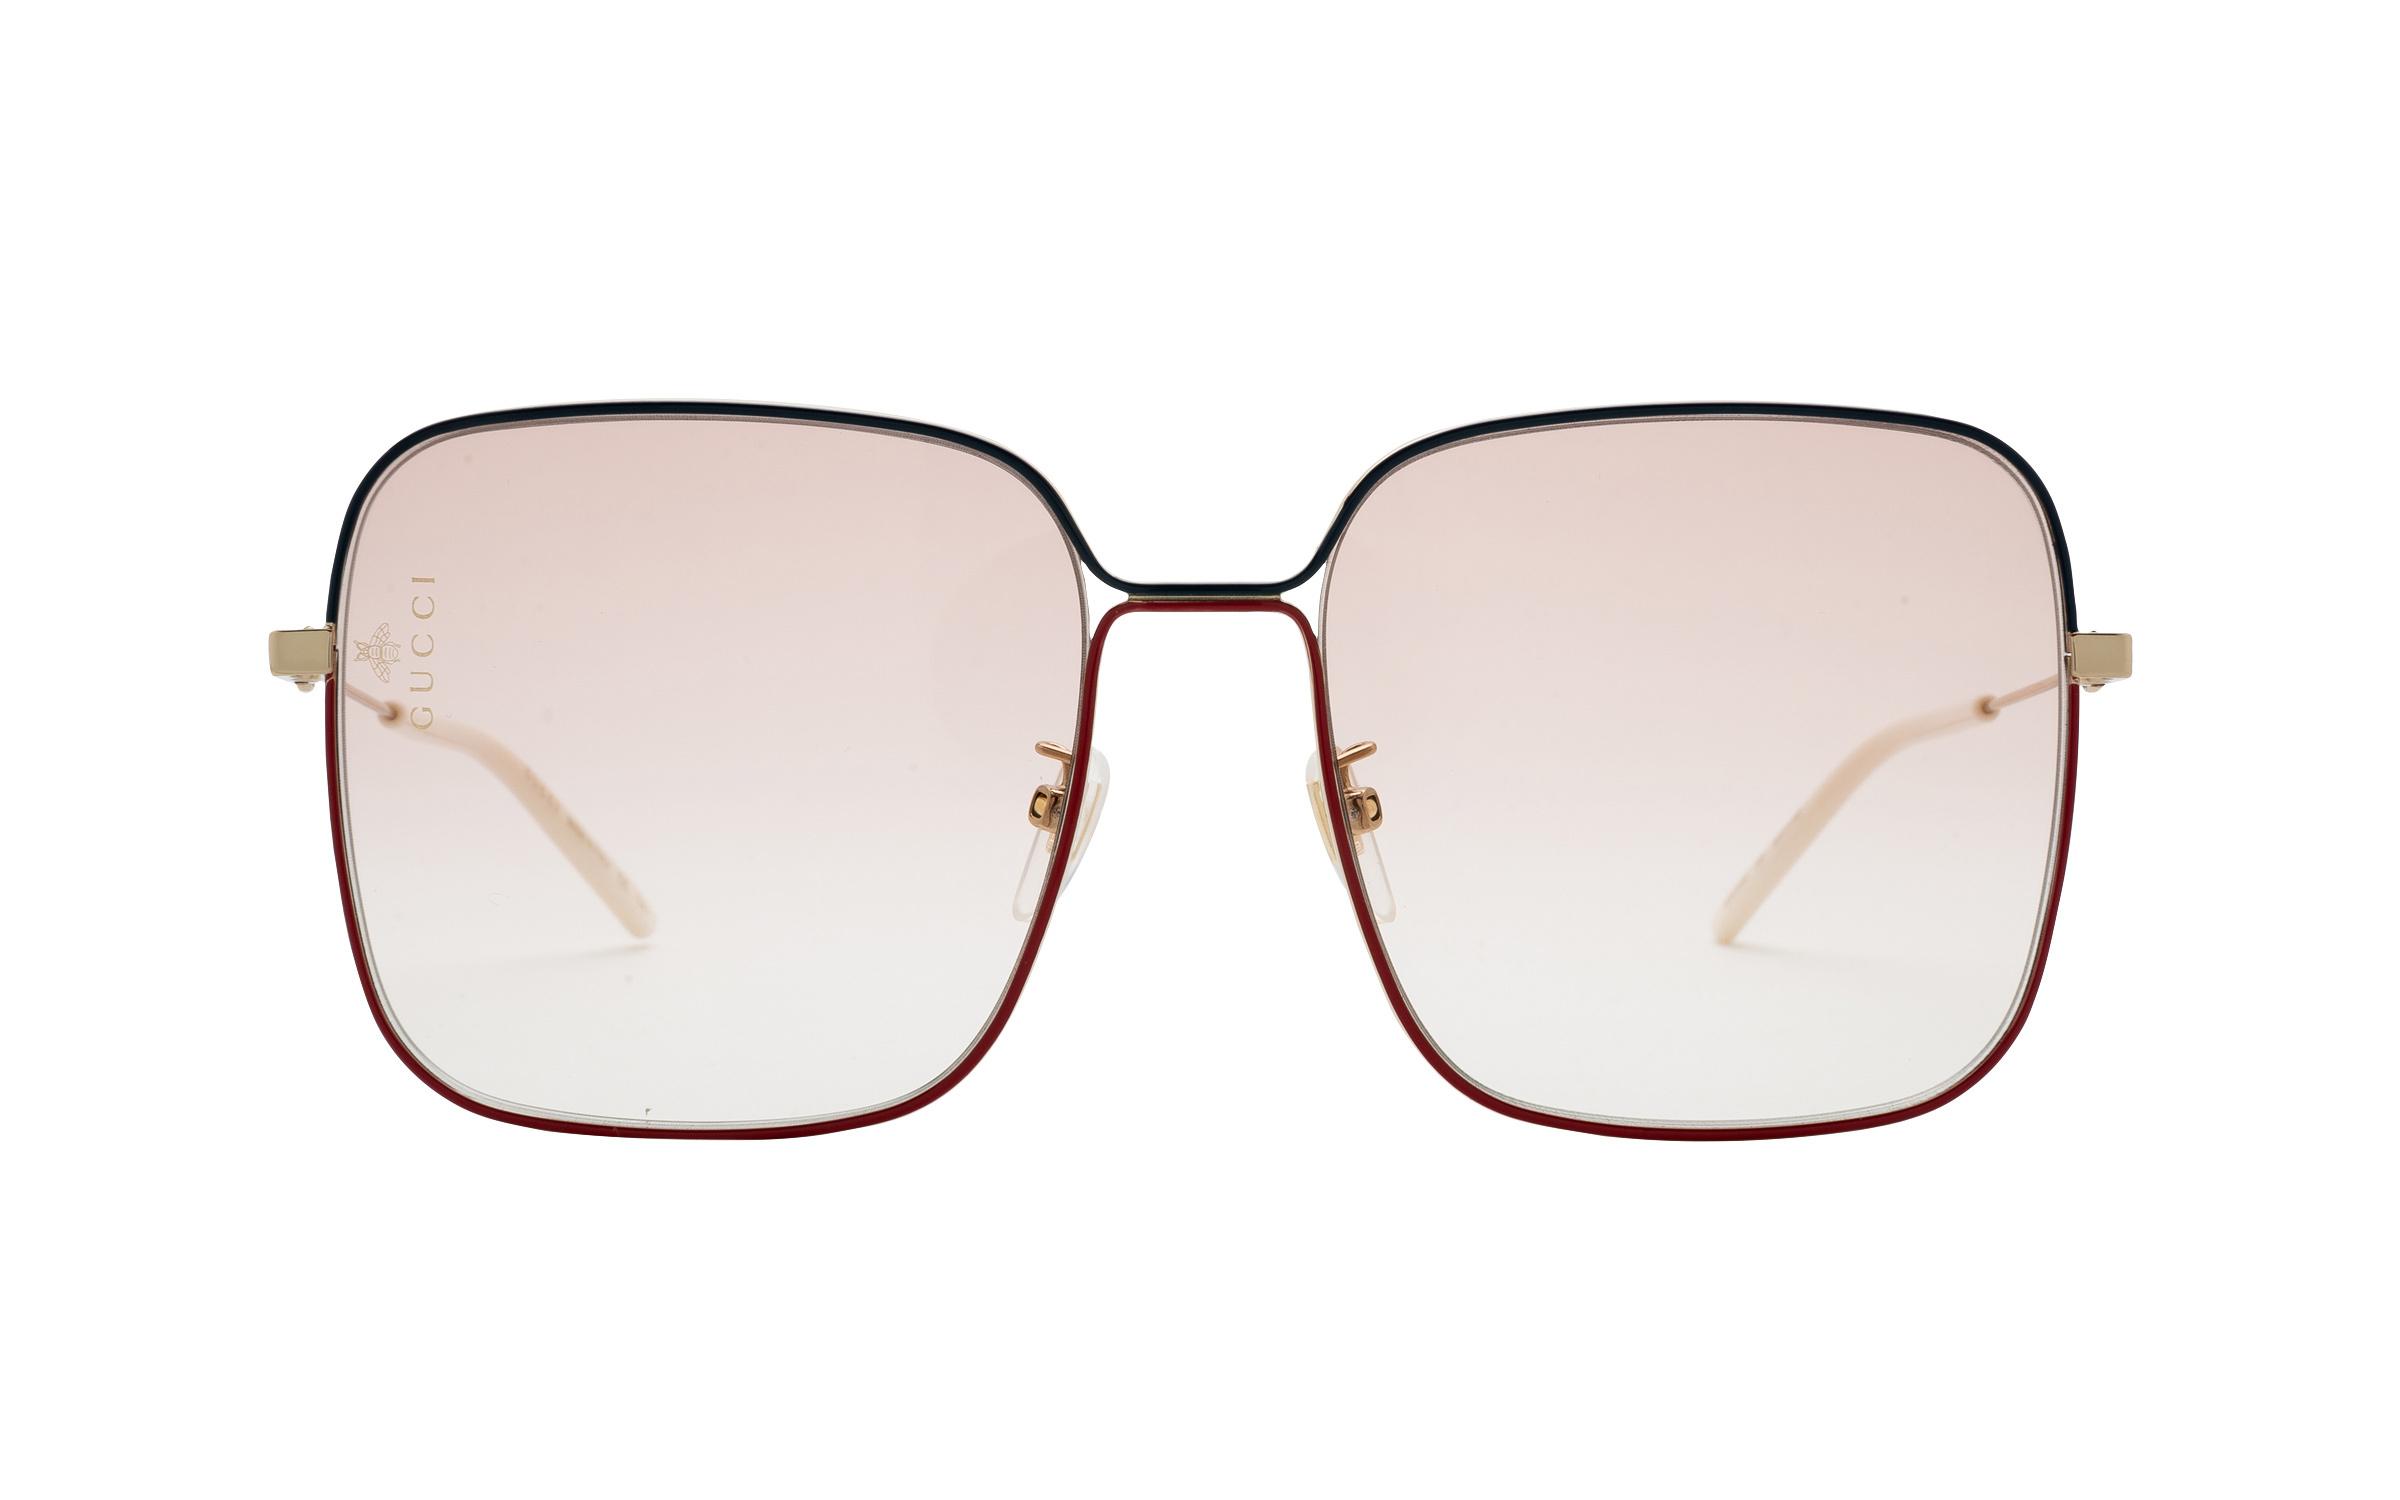 http://www.coastal.com/ - Gucci GG0443S 005 60 Sunglasses in Gold | Acetate/Metal – Online Coastal